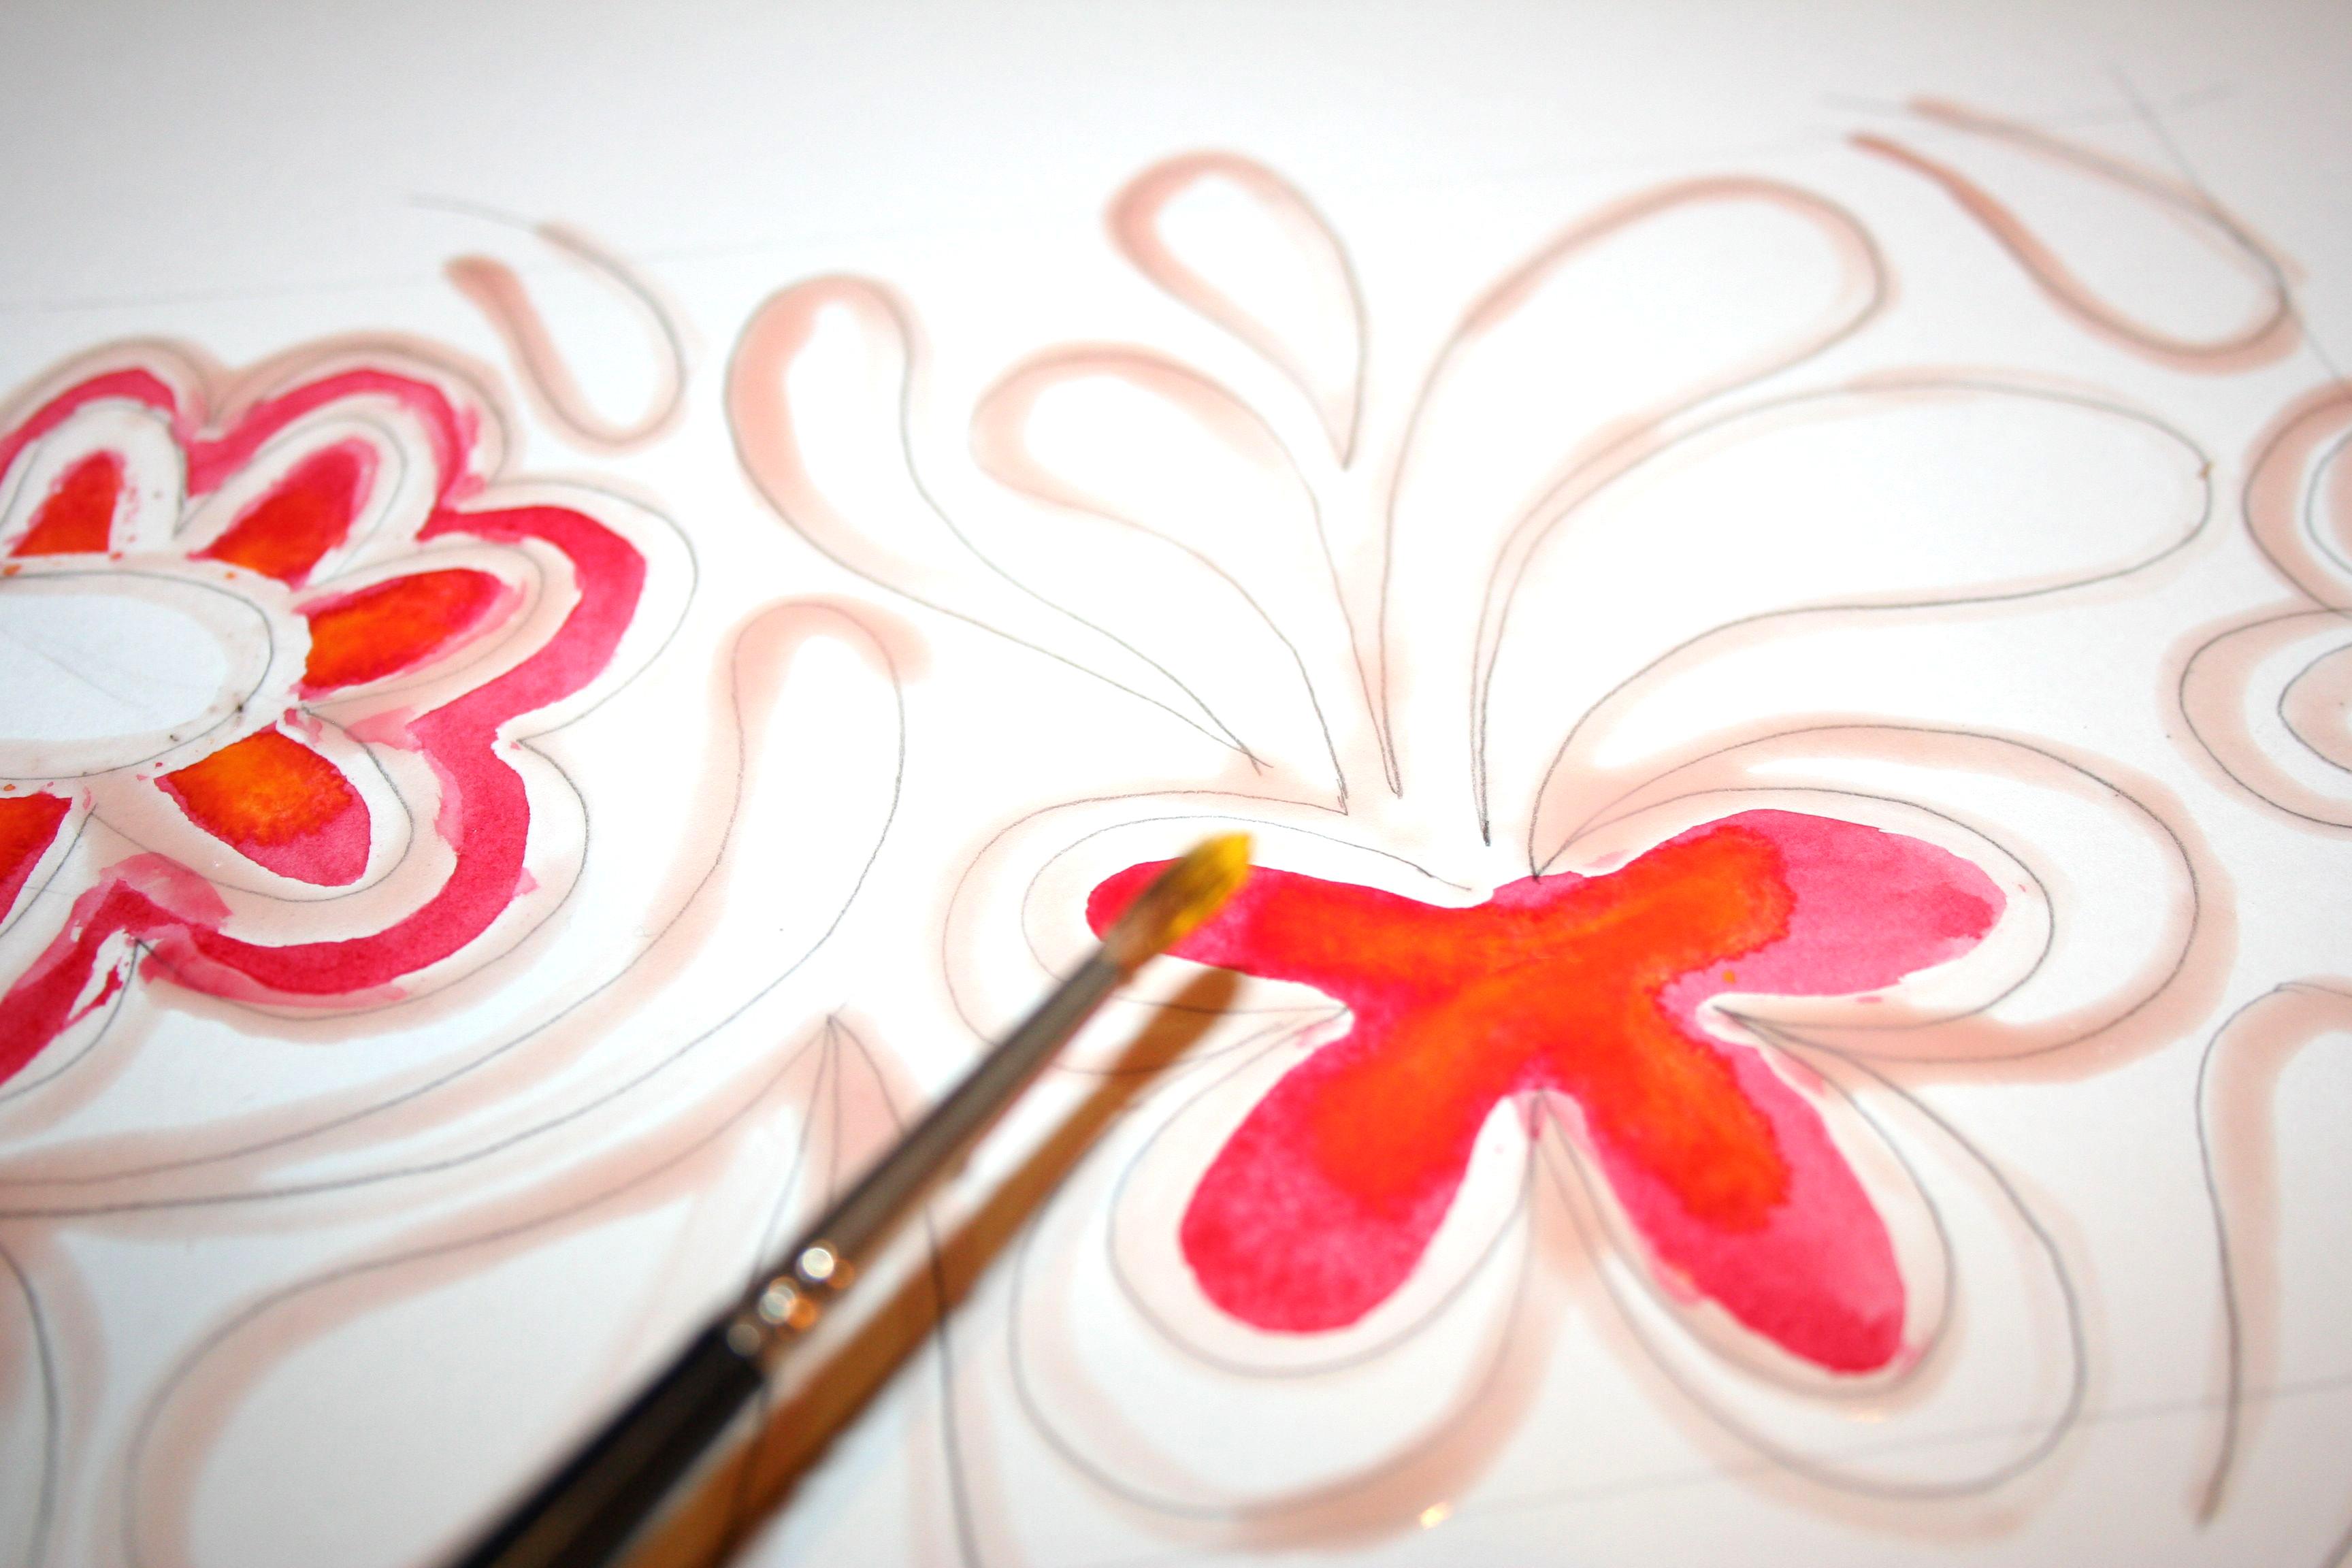 Begin to paint your batik